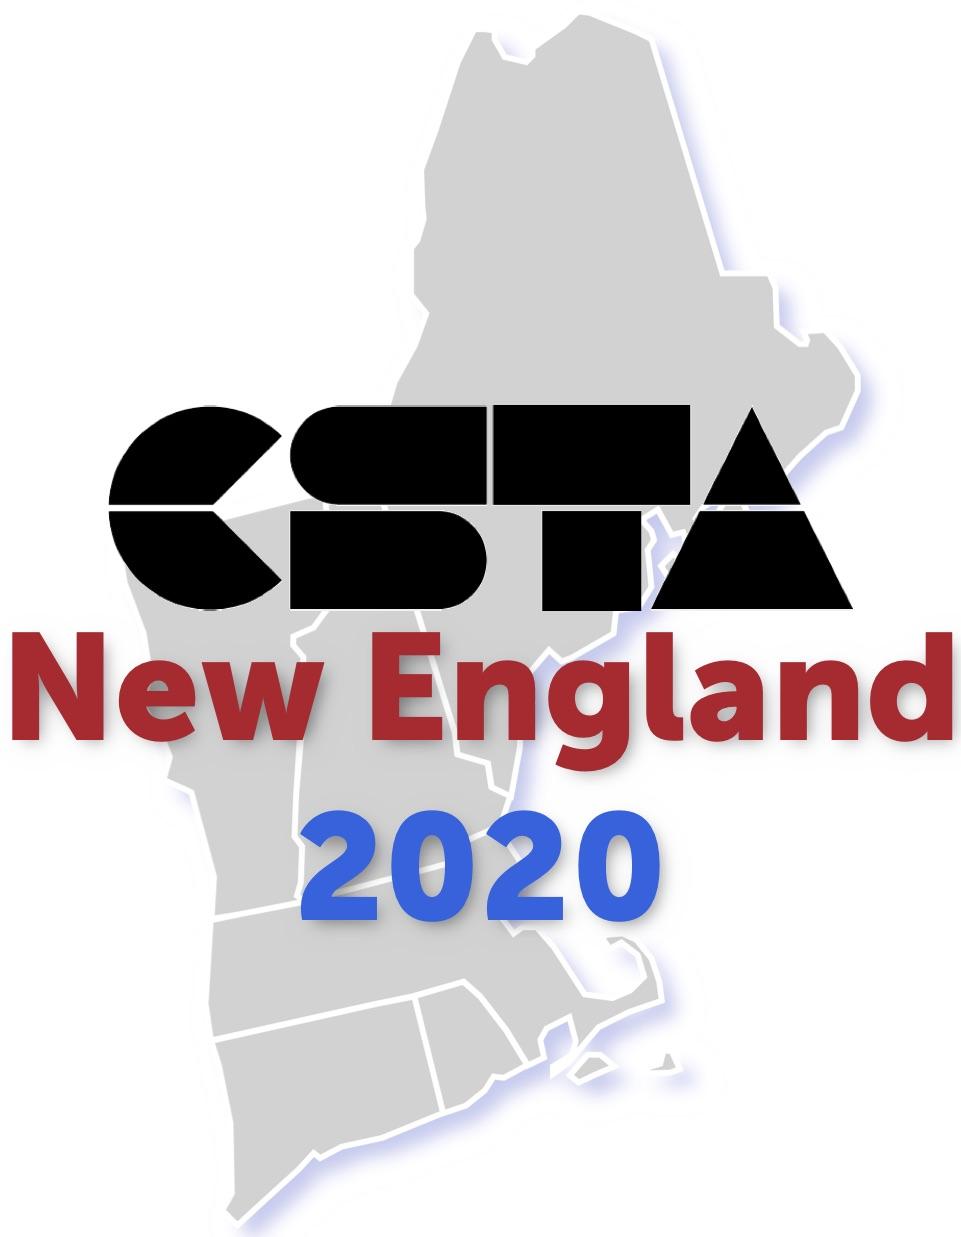 CSTA 4th Annual New England Regional Conference (CSTA Greater Boston (MA))